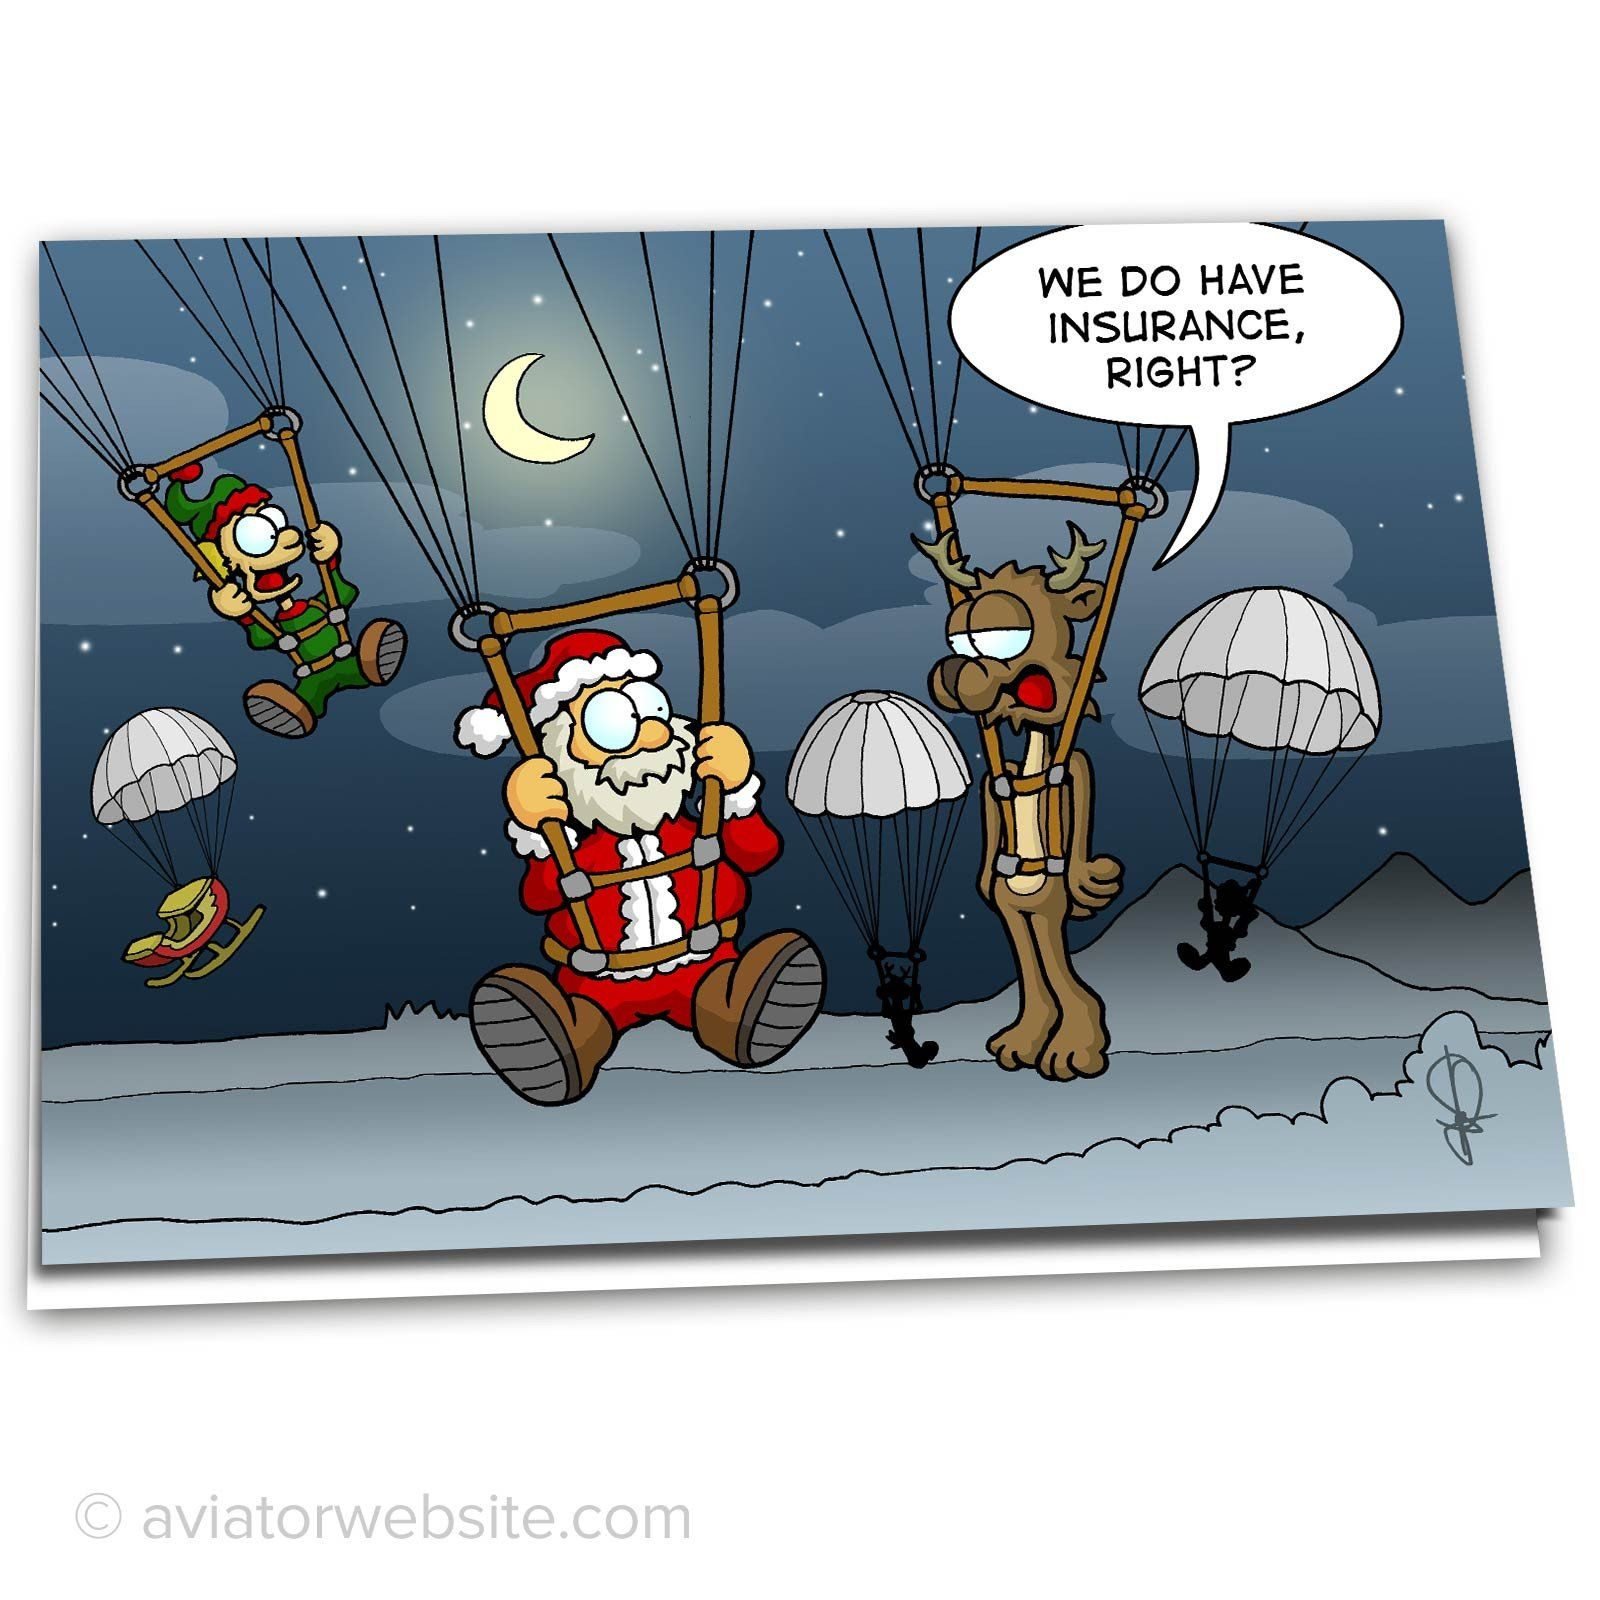 Aviation Christmas Card We Do Have Insurance Right 10 Cards Aviatorwebsite Funny Christmas Jokes Christmas Humor Christmas Humor Ecards